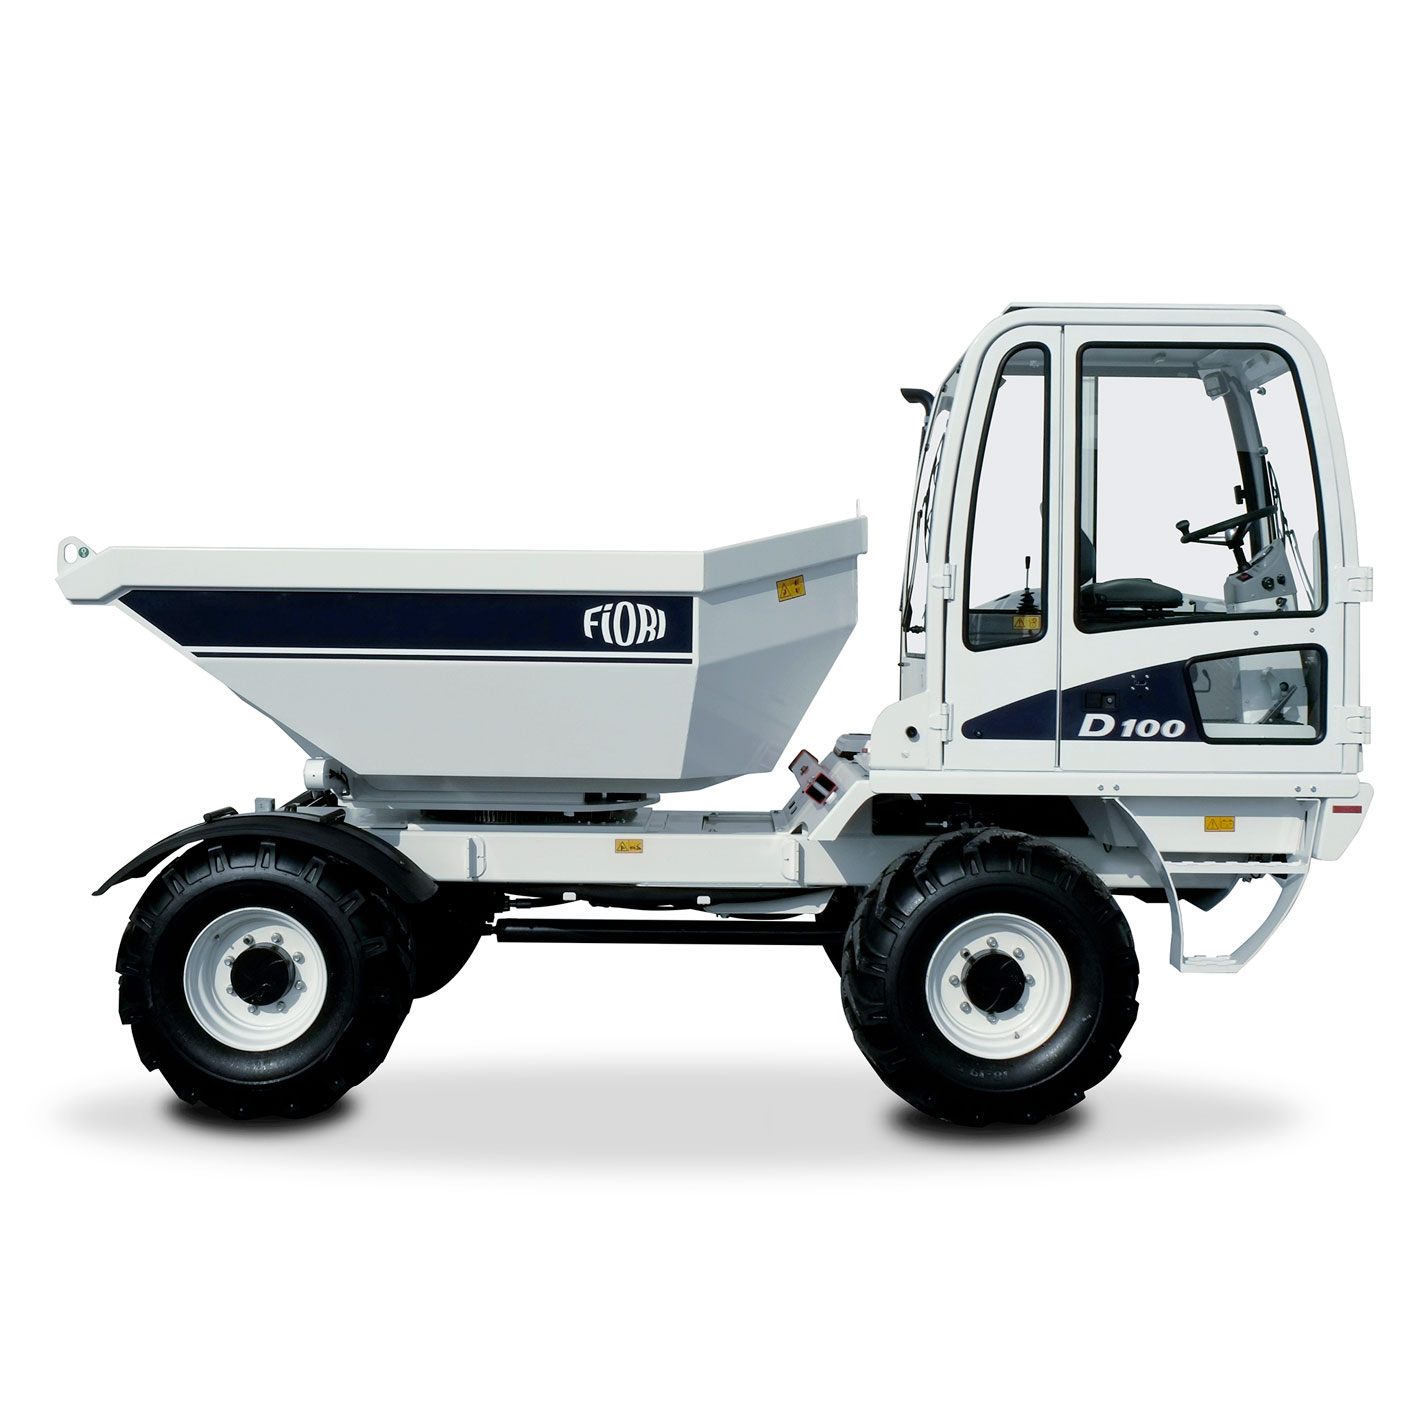 Dumper transporte de materiales 10 ton D100